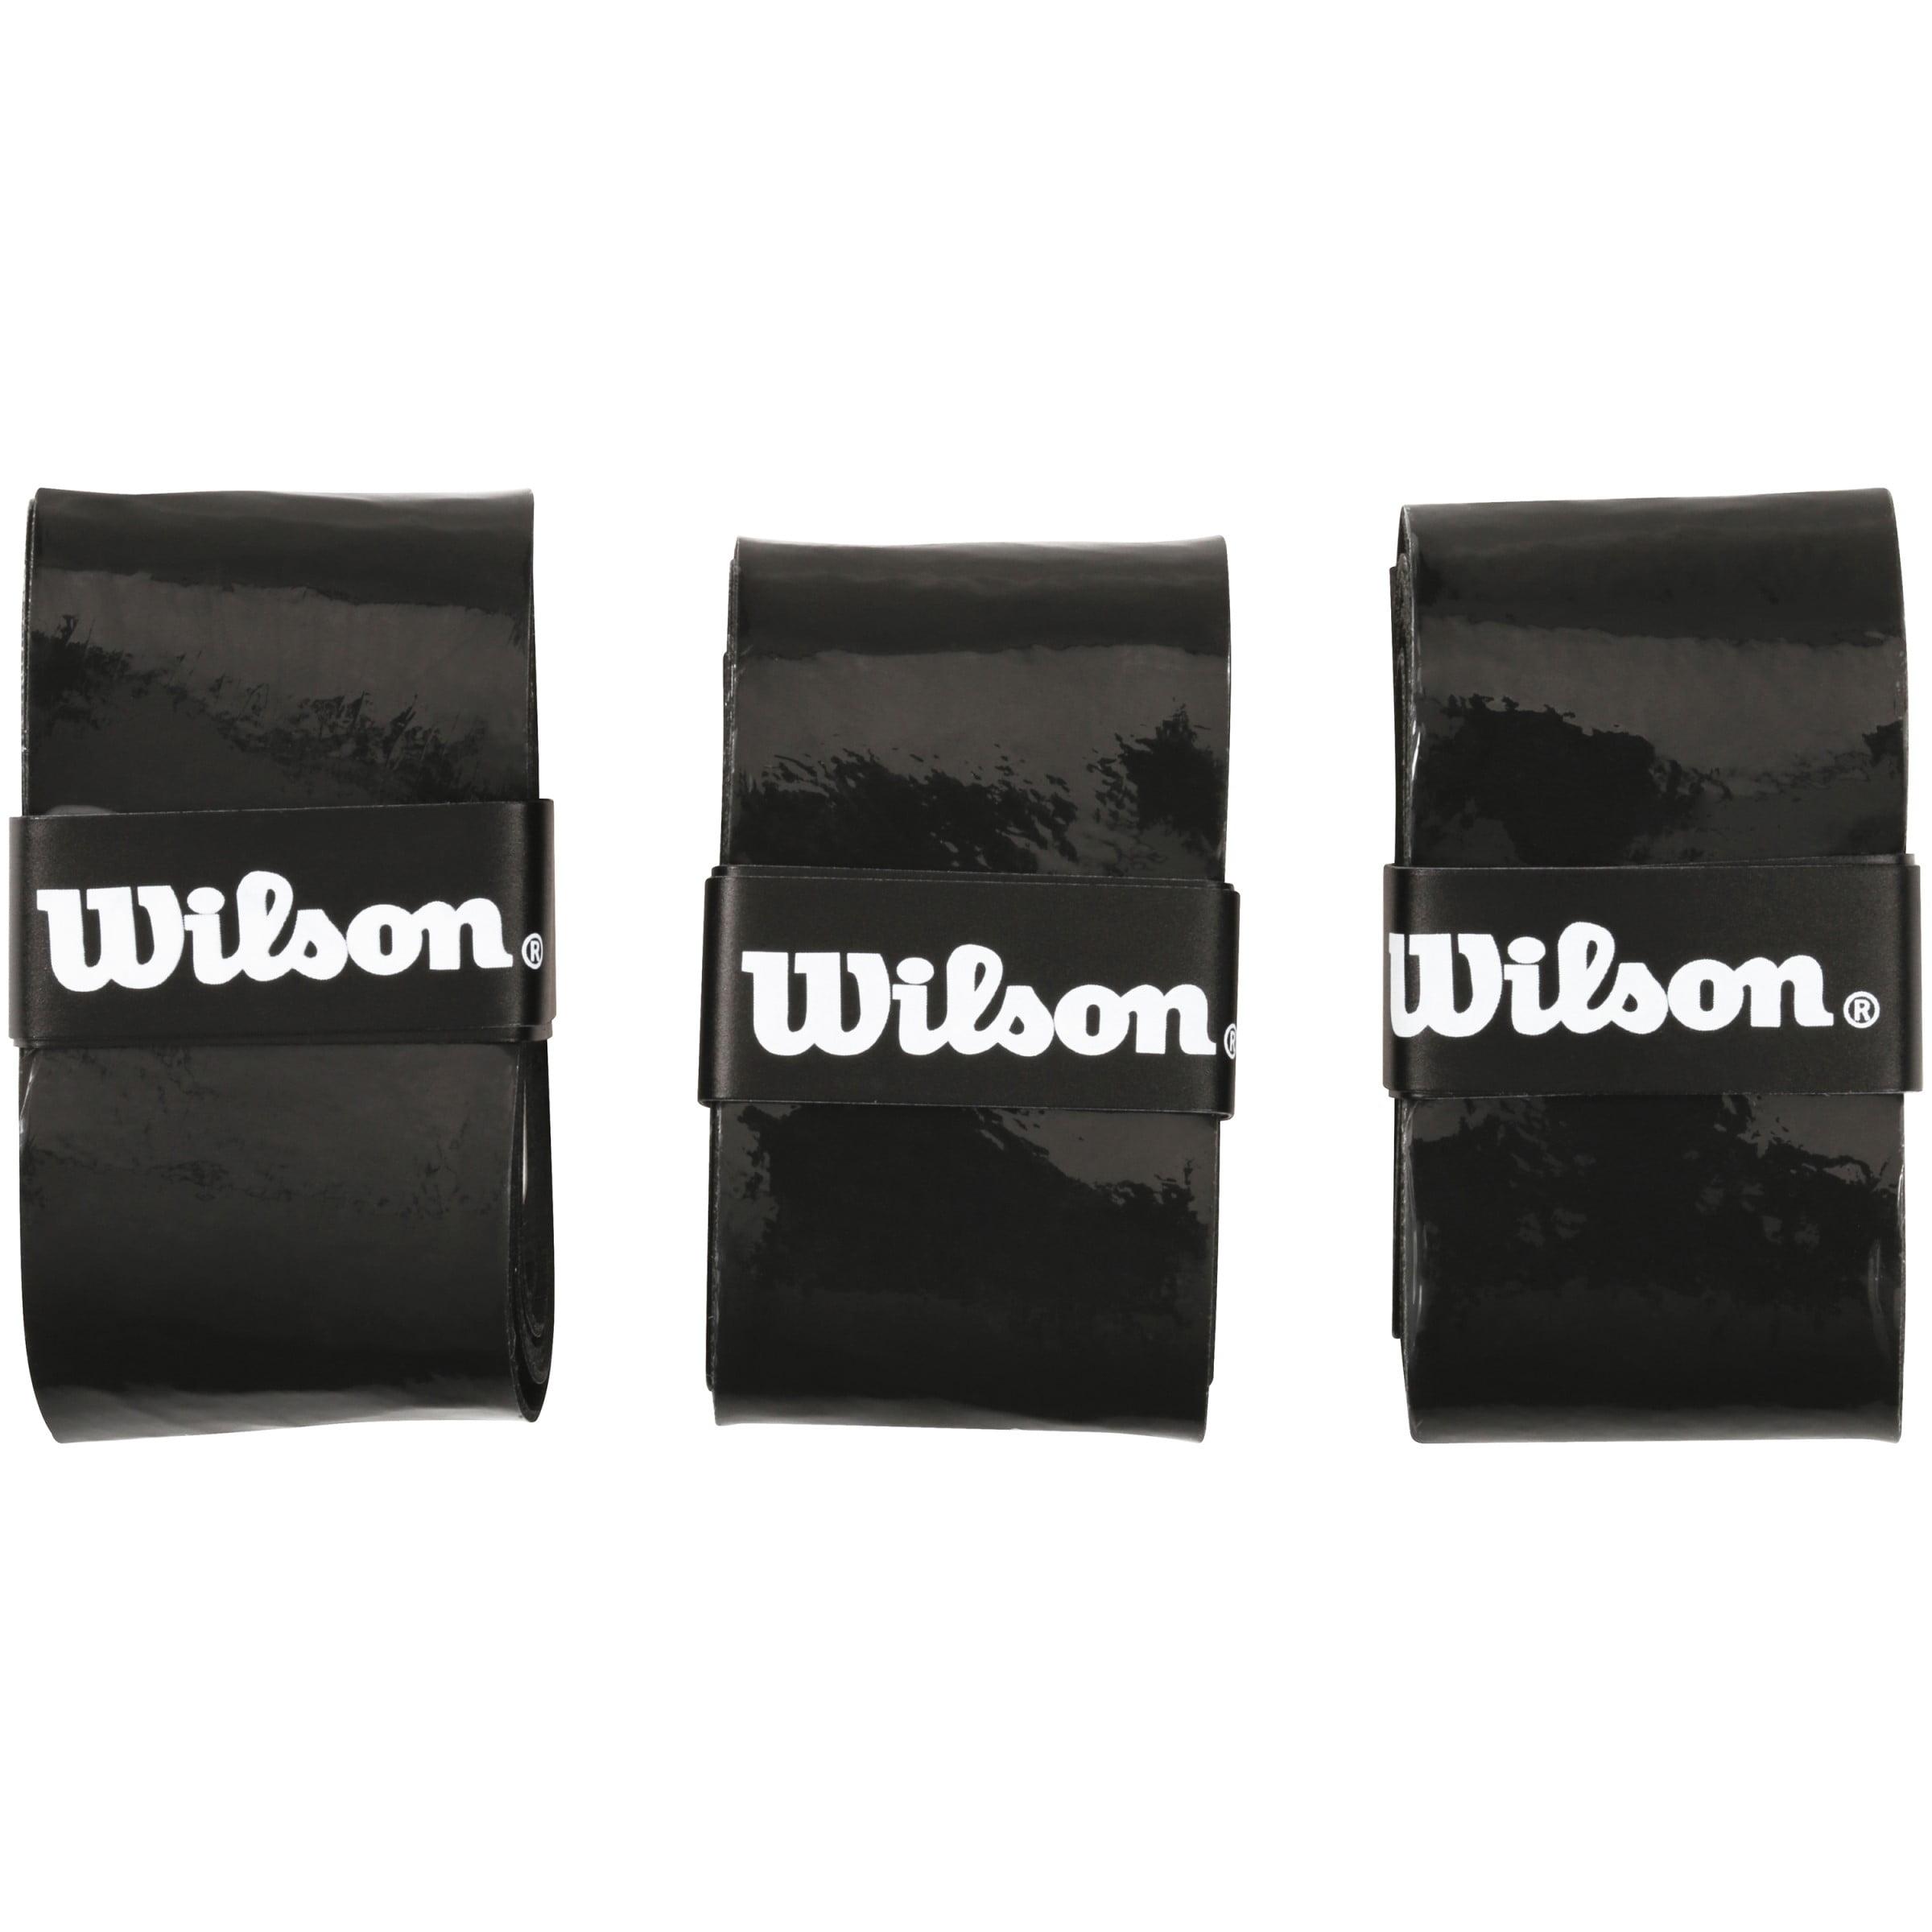 546555a2f Wilson Ultra Wrap Comfort Overgrip (3-Pack), Black - Walmart.com